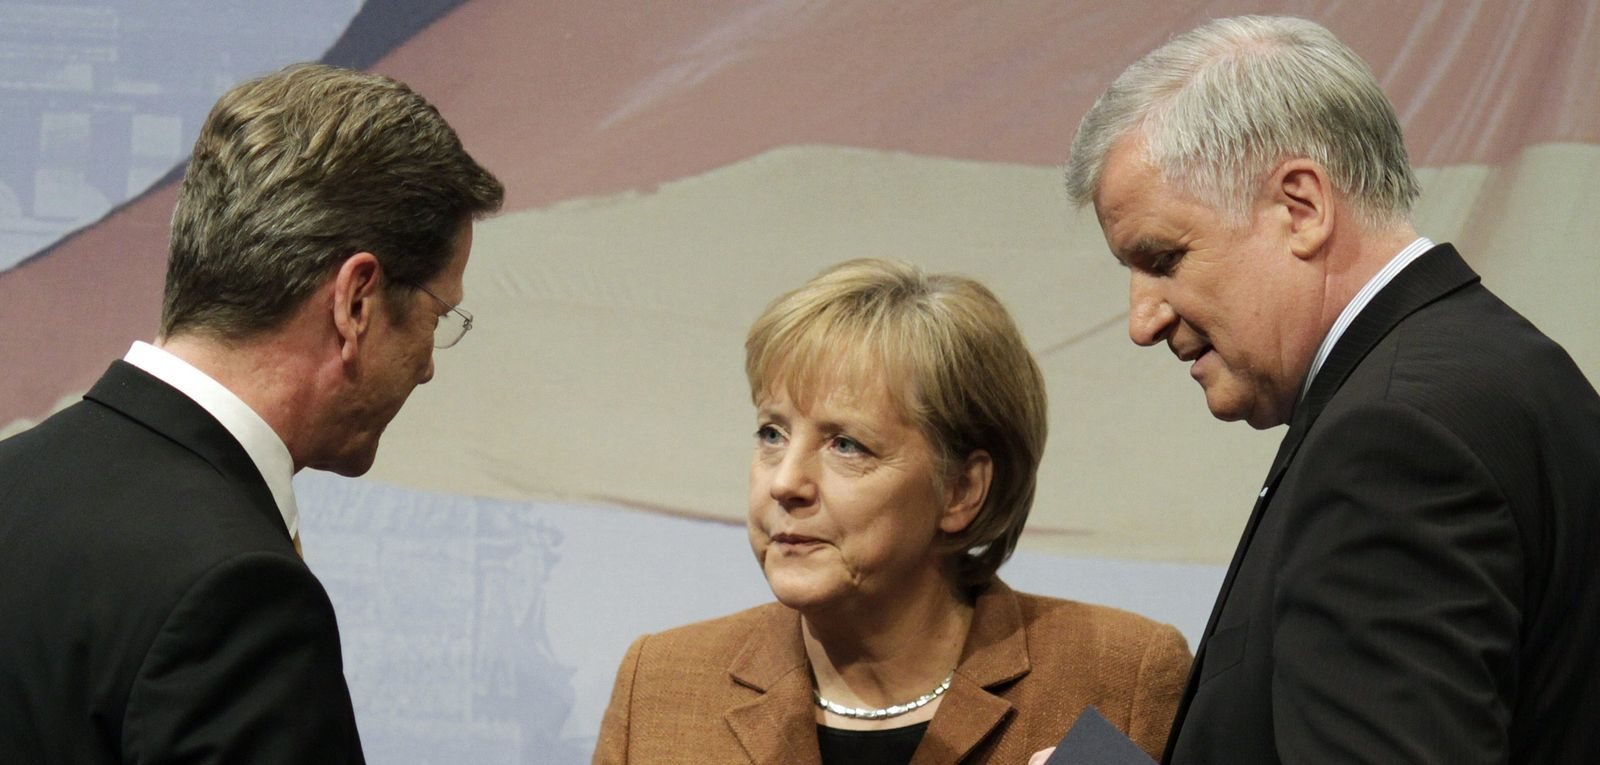 Merkel Westerwelle Seehofer